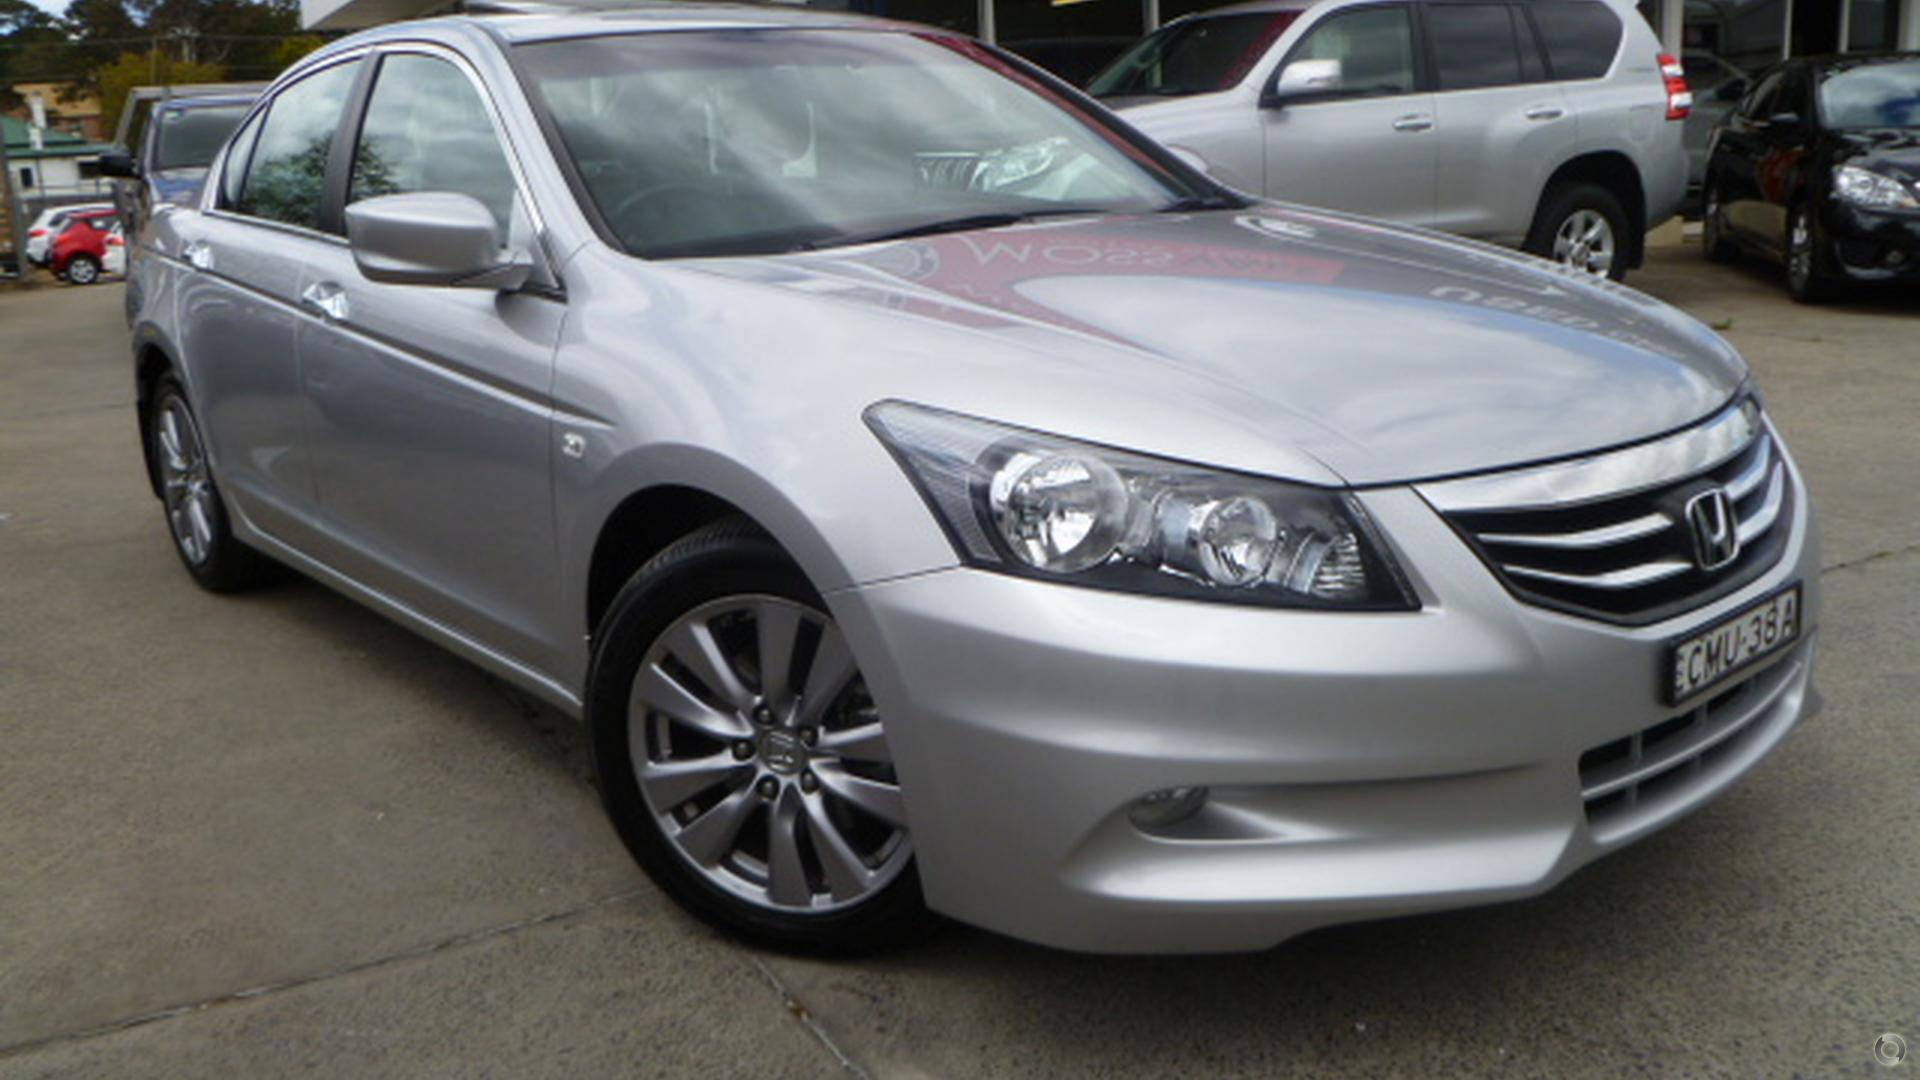 2012 Honda Accord Limited Edition 8th Gen